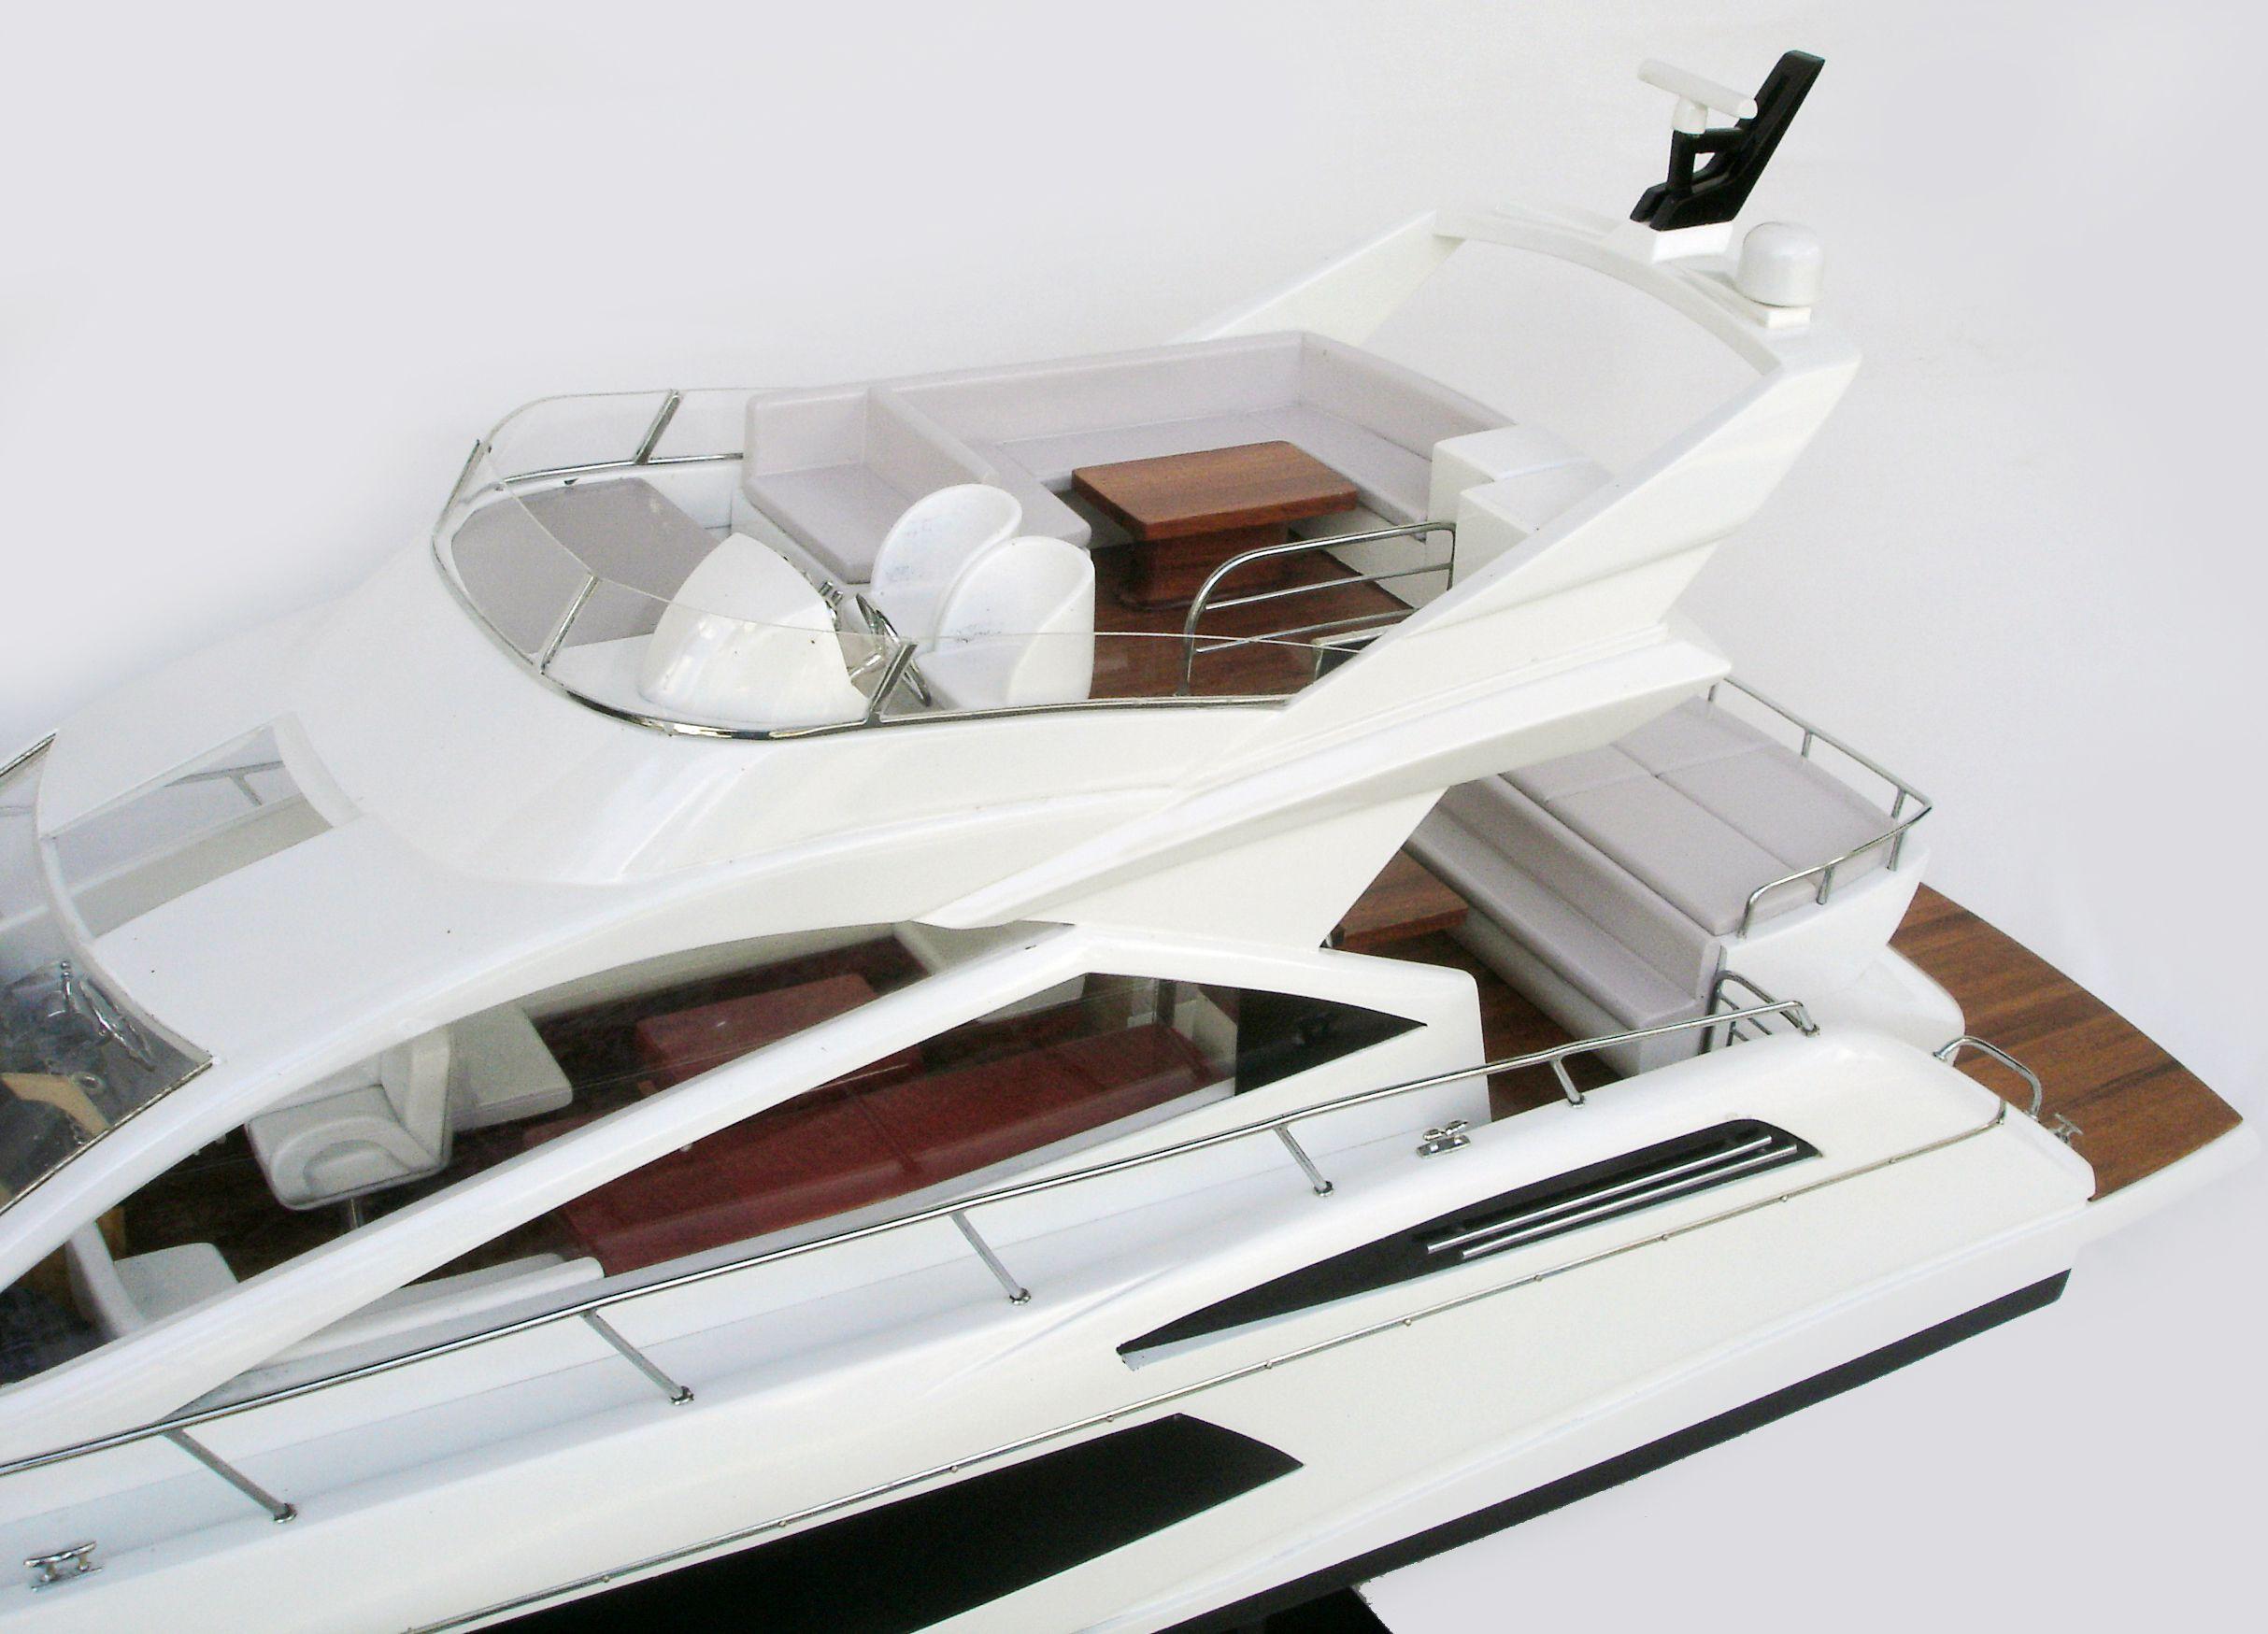 Sunseeker 68 Model Yacht - GN (CM0082P)